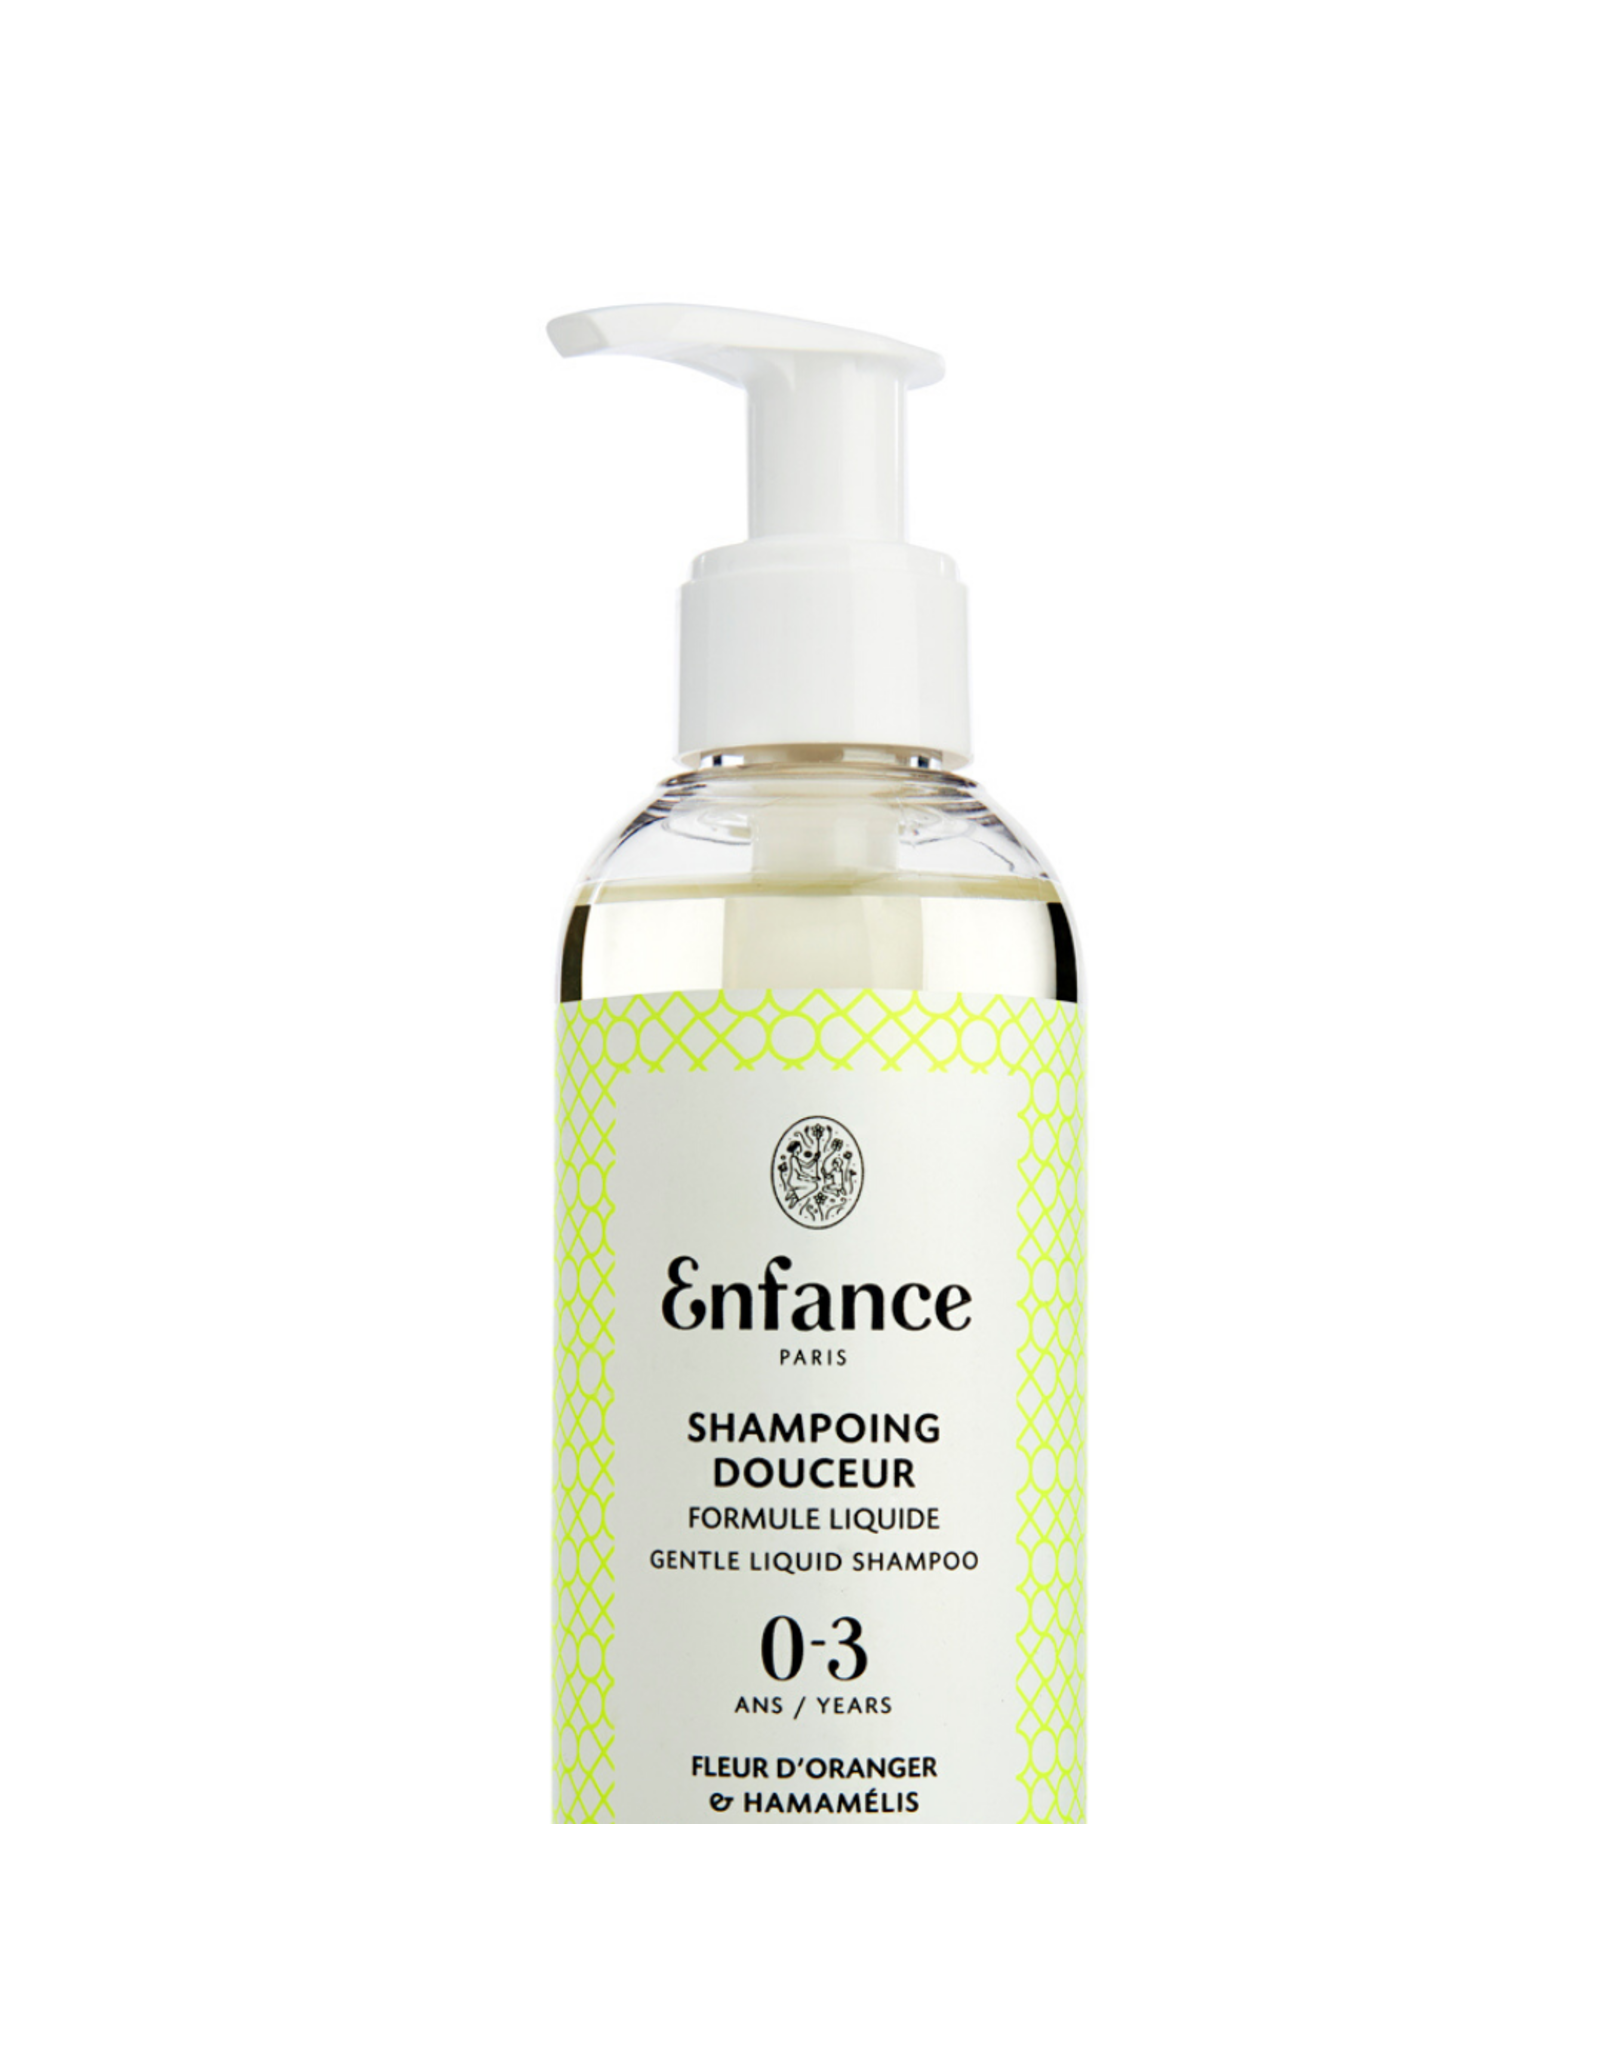 Enfance Shampoing Douceur - 0 - 3 ans